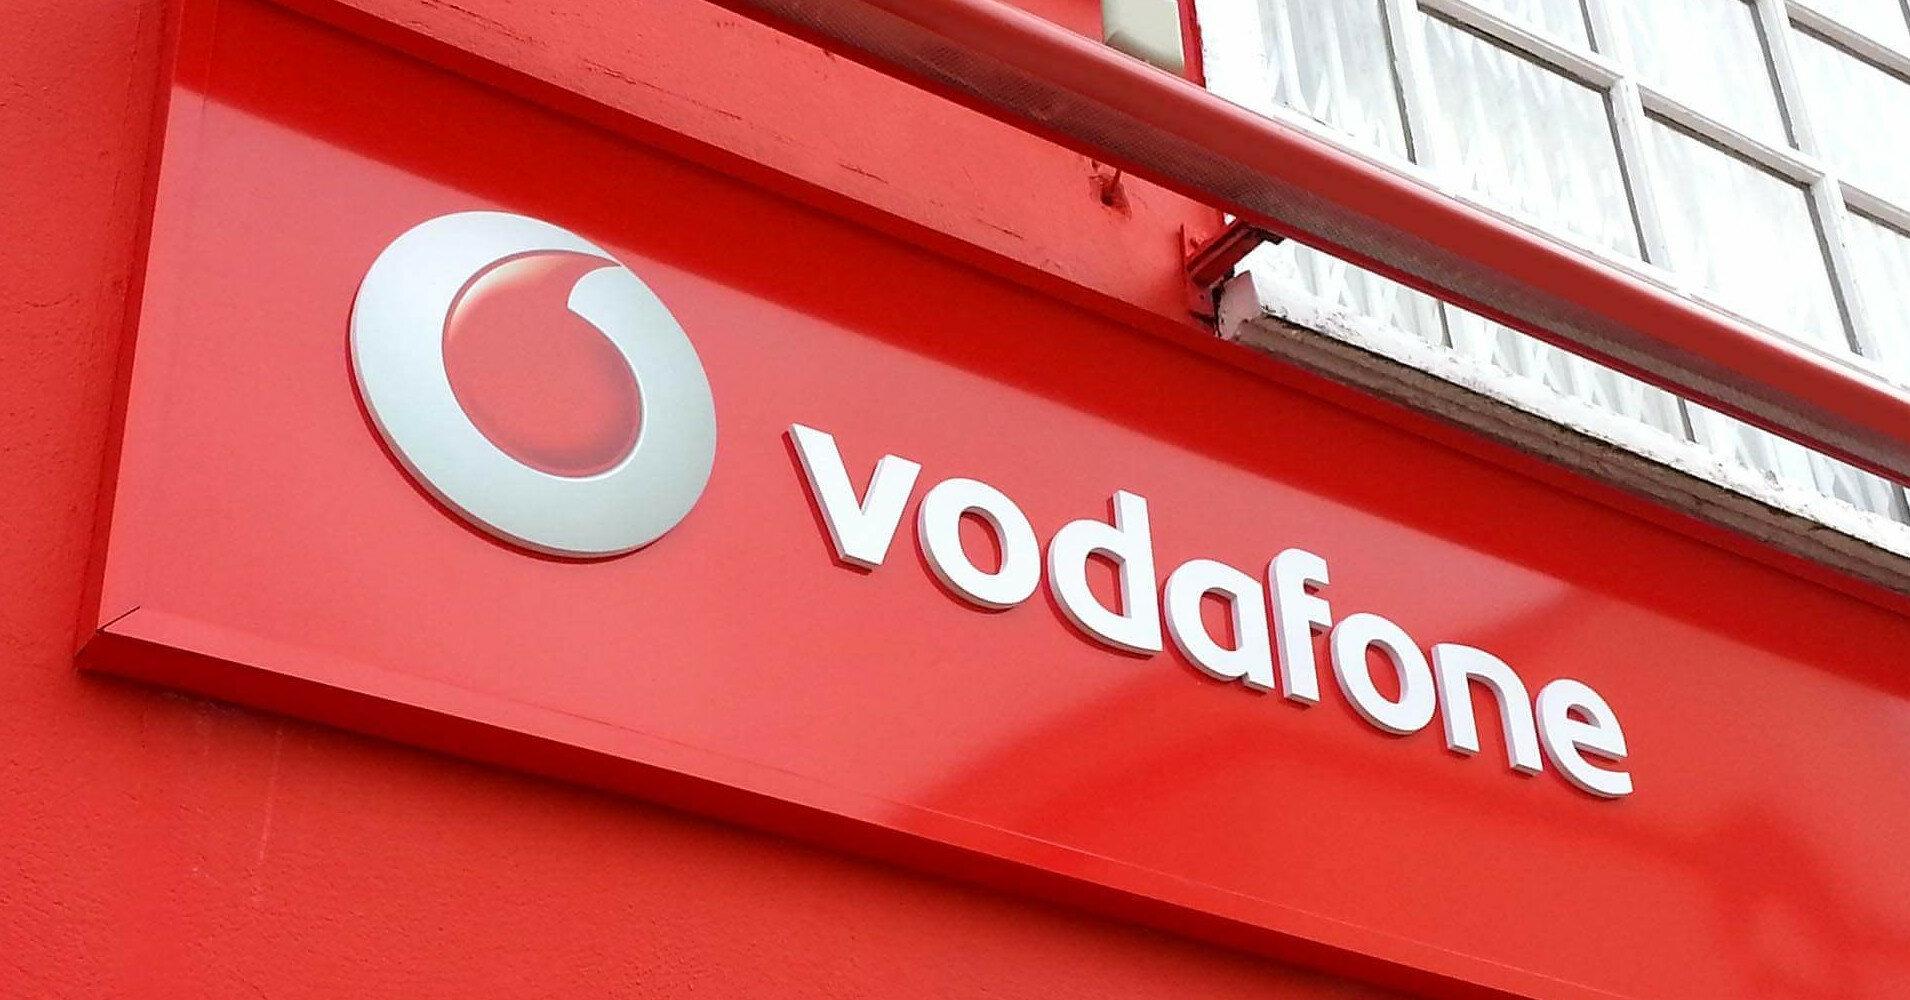 Vodafone озвучил сумму сделки по покупке оператора Vega